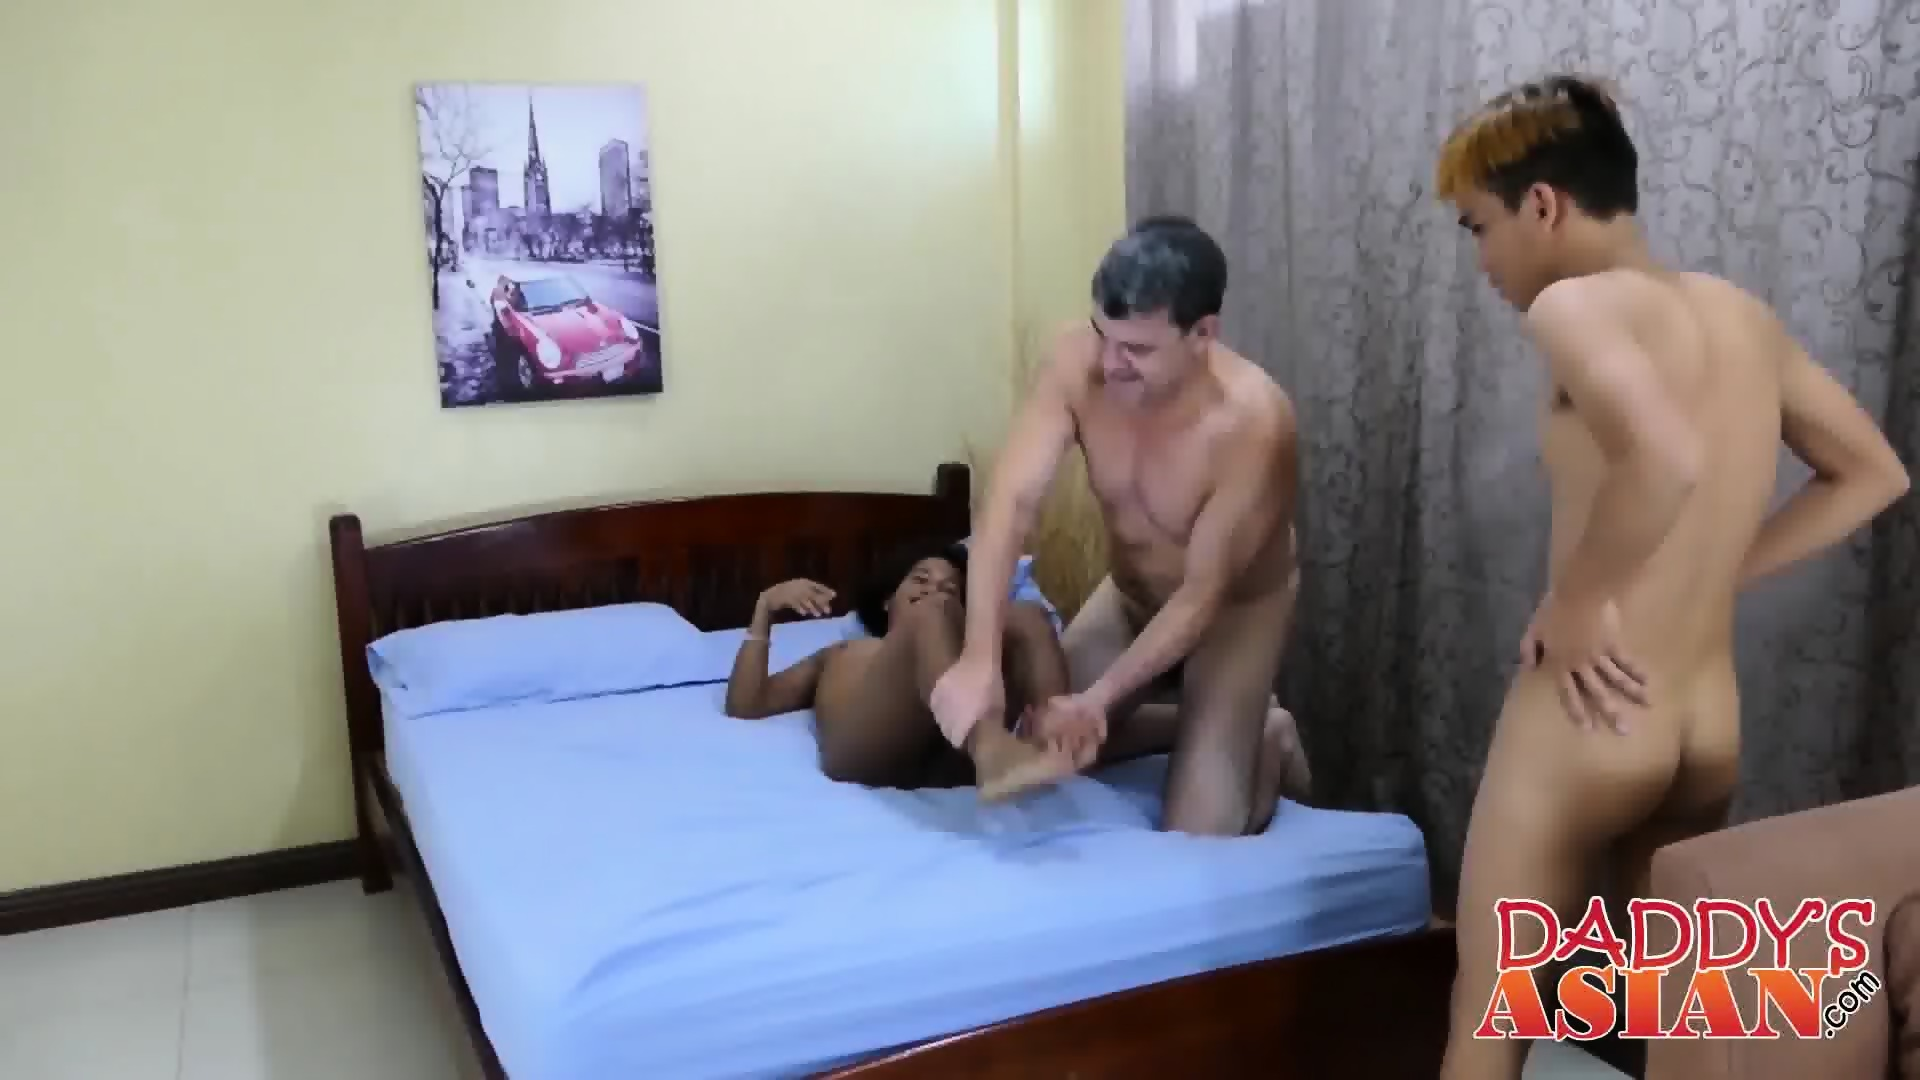 bondage sex 24